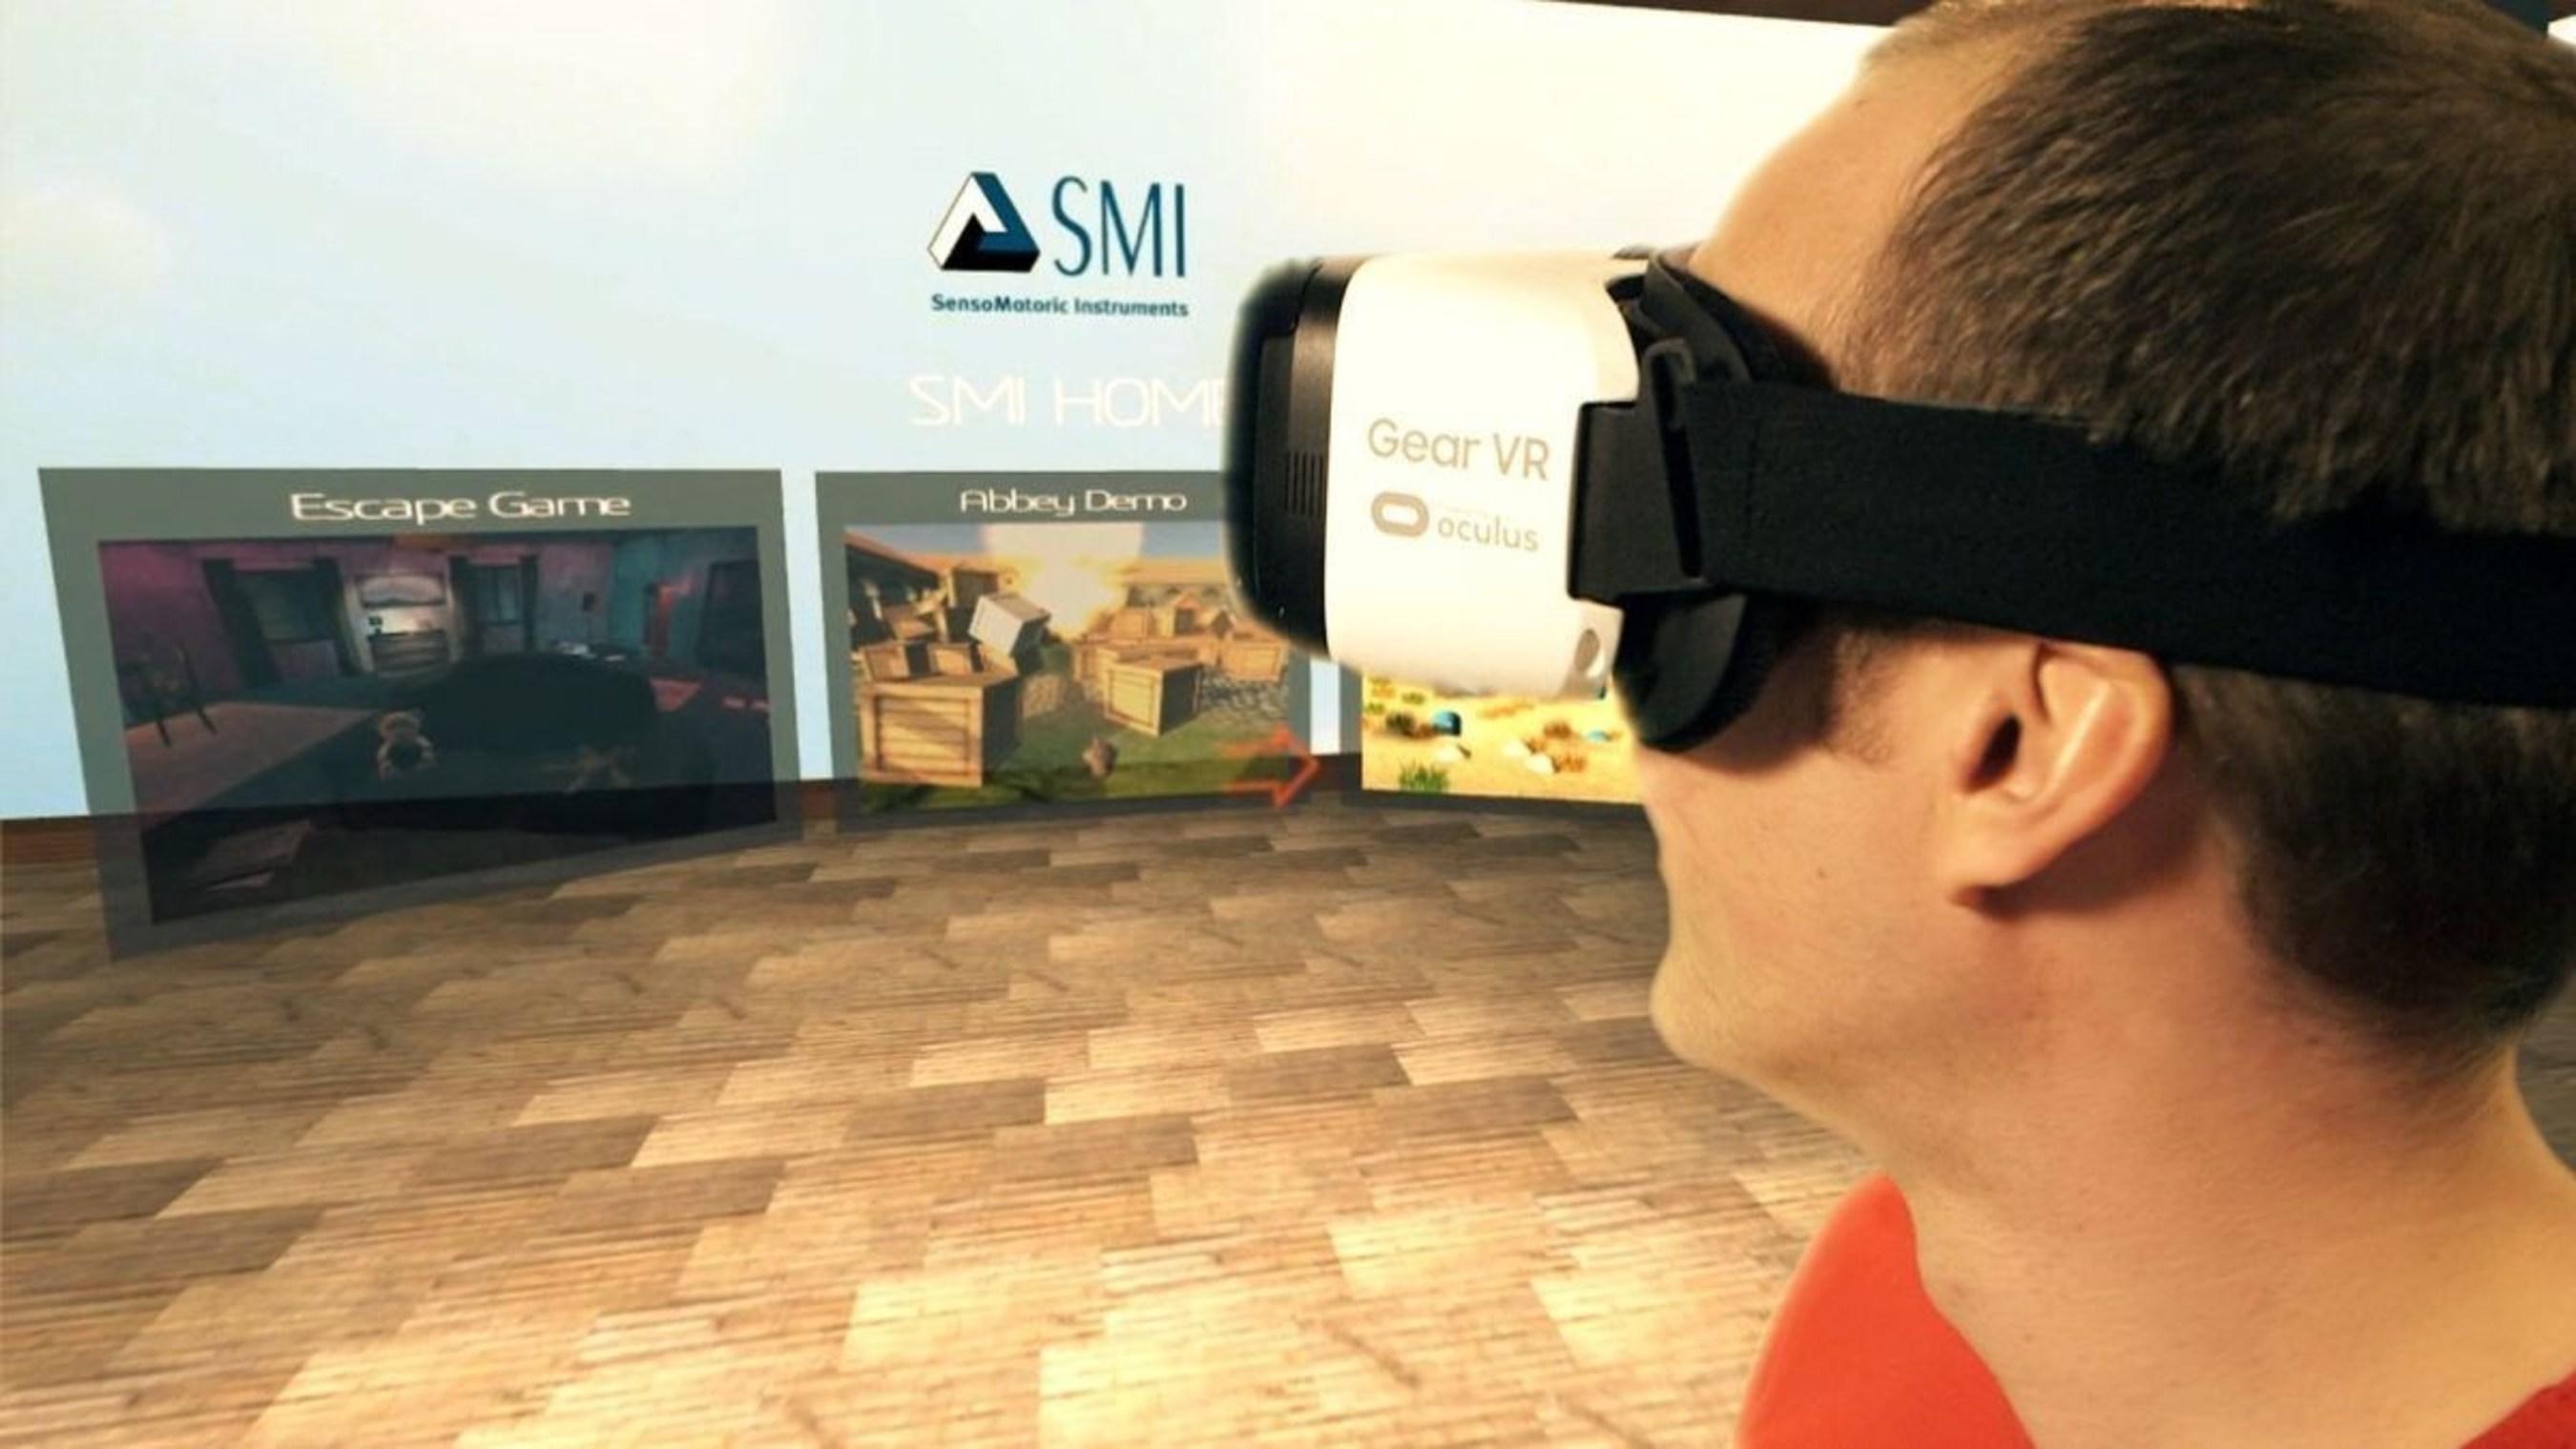 SMI brings eye tracking to mobile virtual reality (PRNewsFoto/SensoMotoric Instruments GmbH) (PRNewsFoto/SensoMotoric Instruments GmbH)